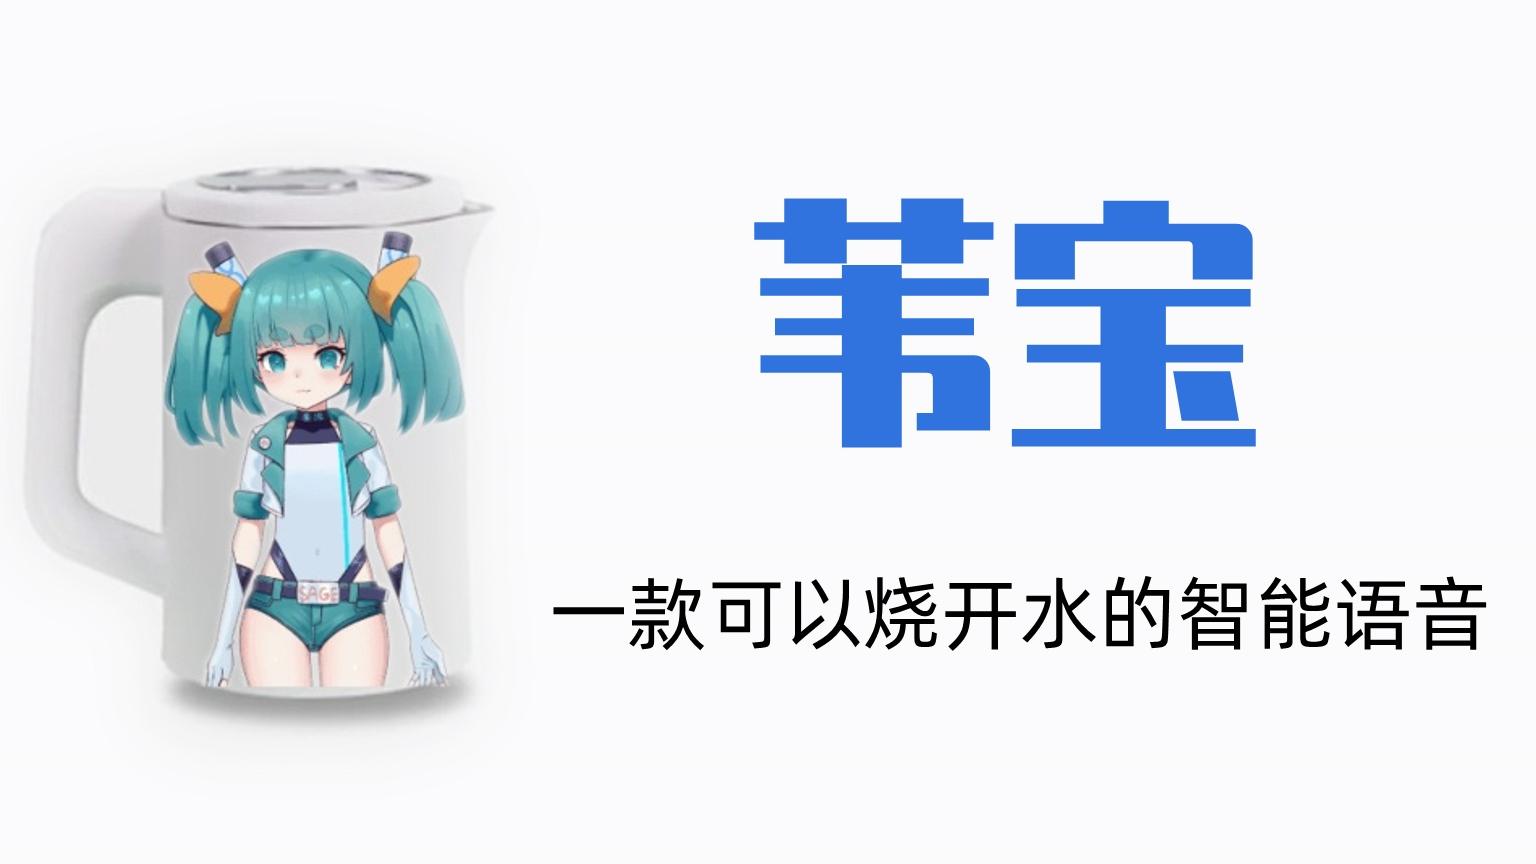 【A站独家】国内首个内置芦苇娘语音包的人工智能